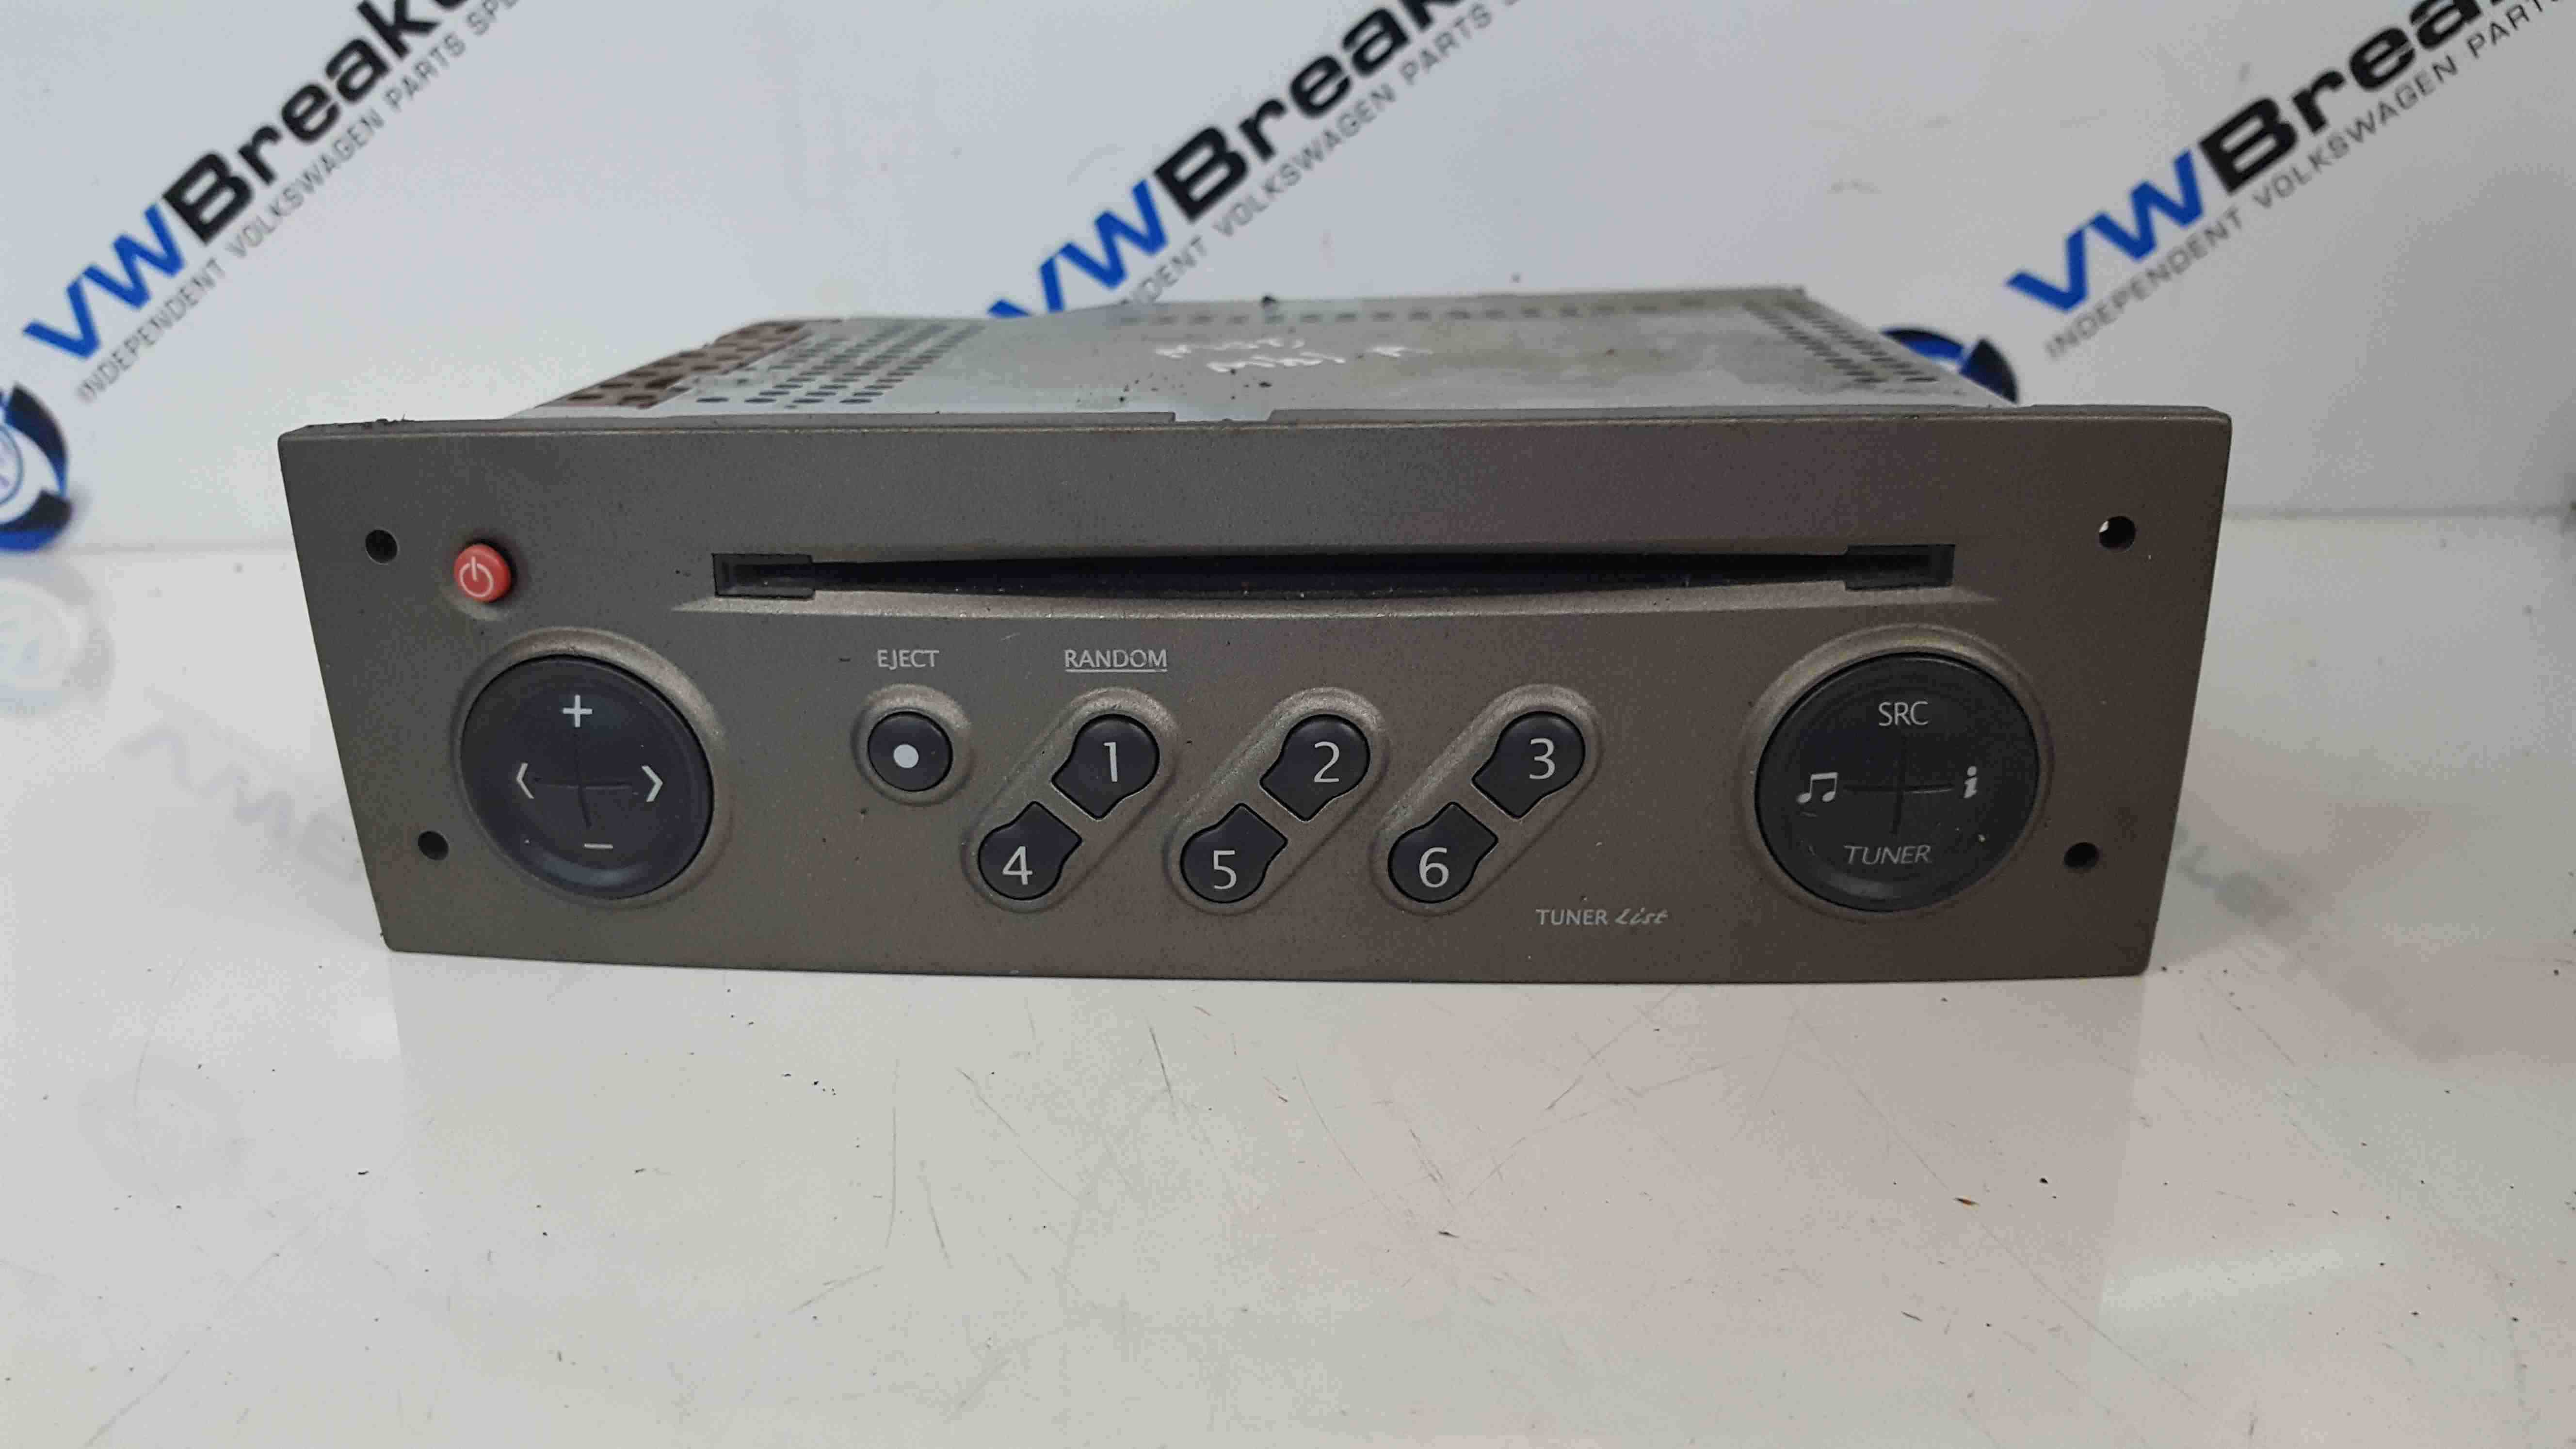 Renault Modus 2004-2008 Radio Cd Player Tuner List Beige Gold With Code